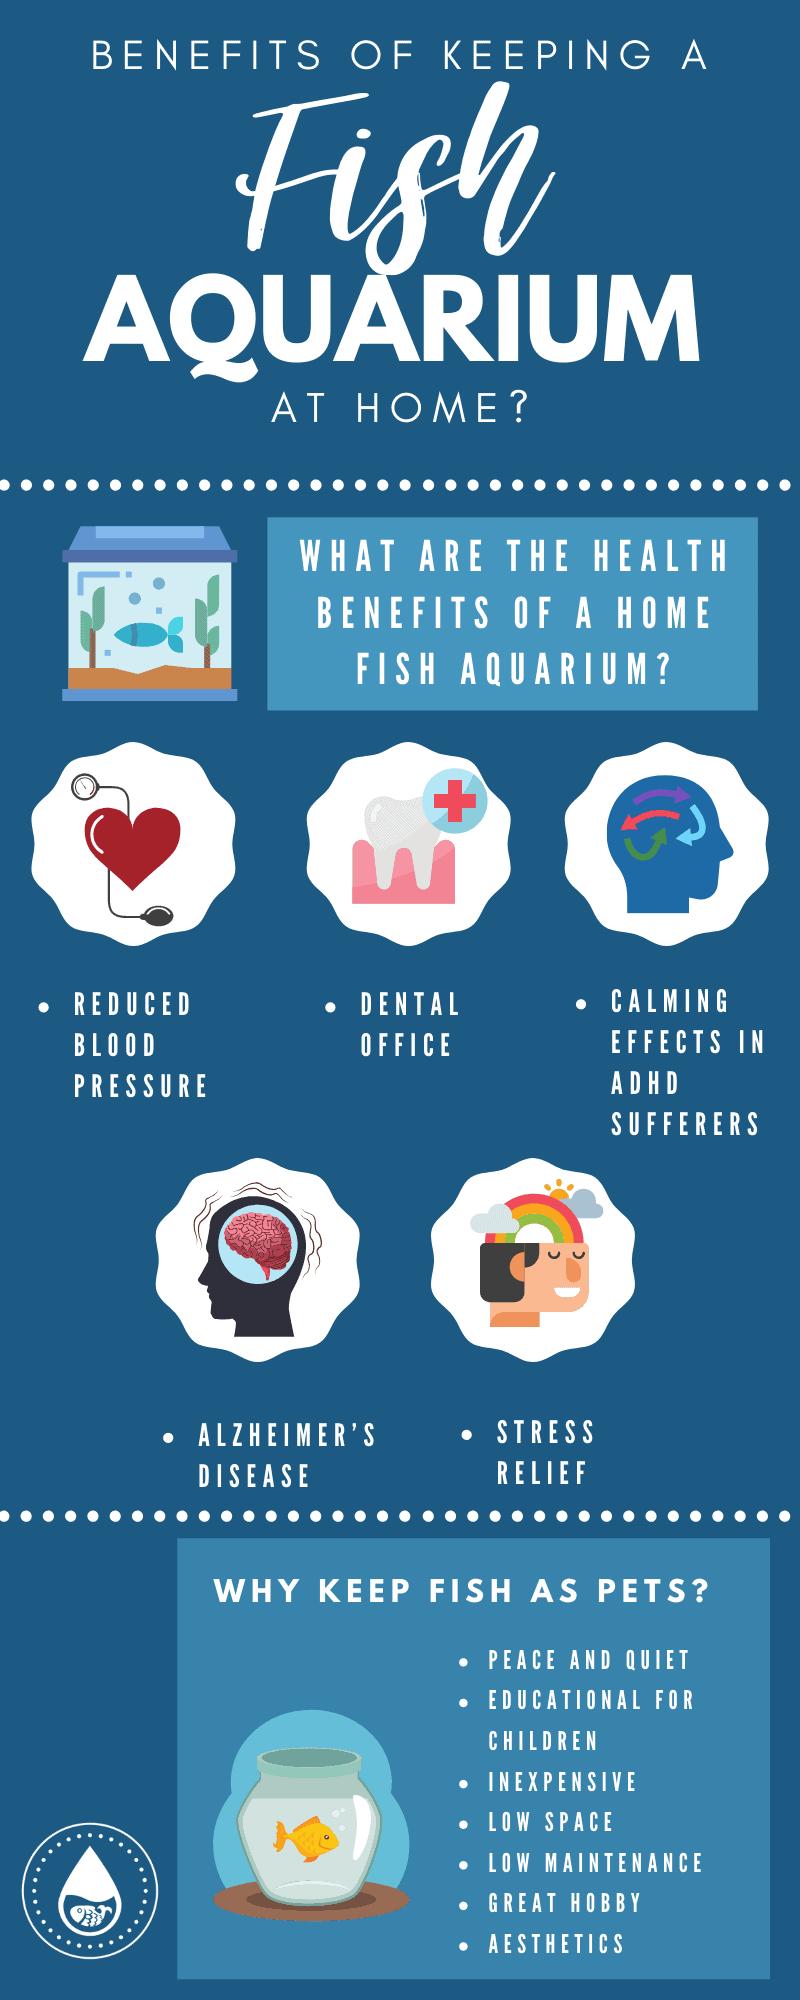 Benefits of Keeping a Fish Aquarium At Home - Infographic